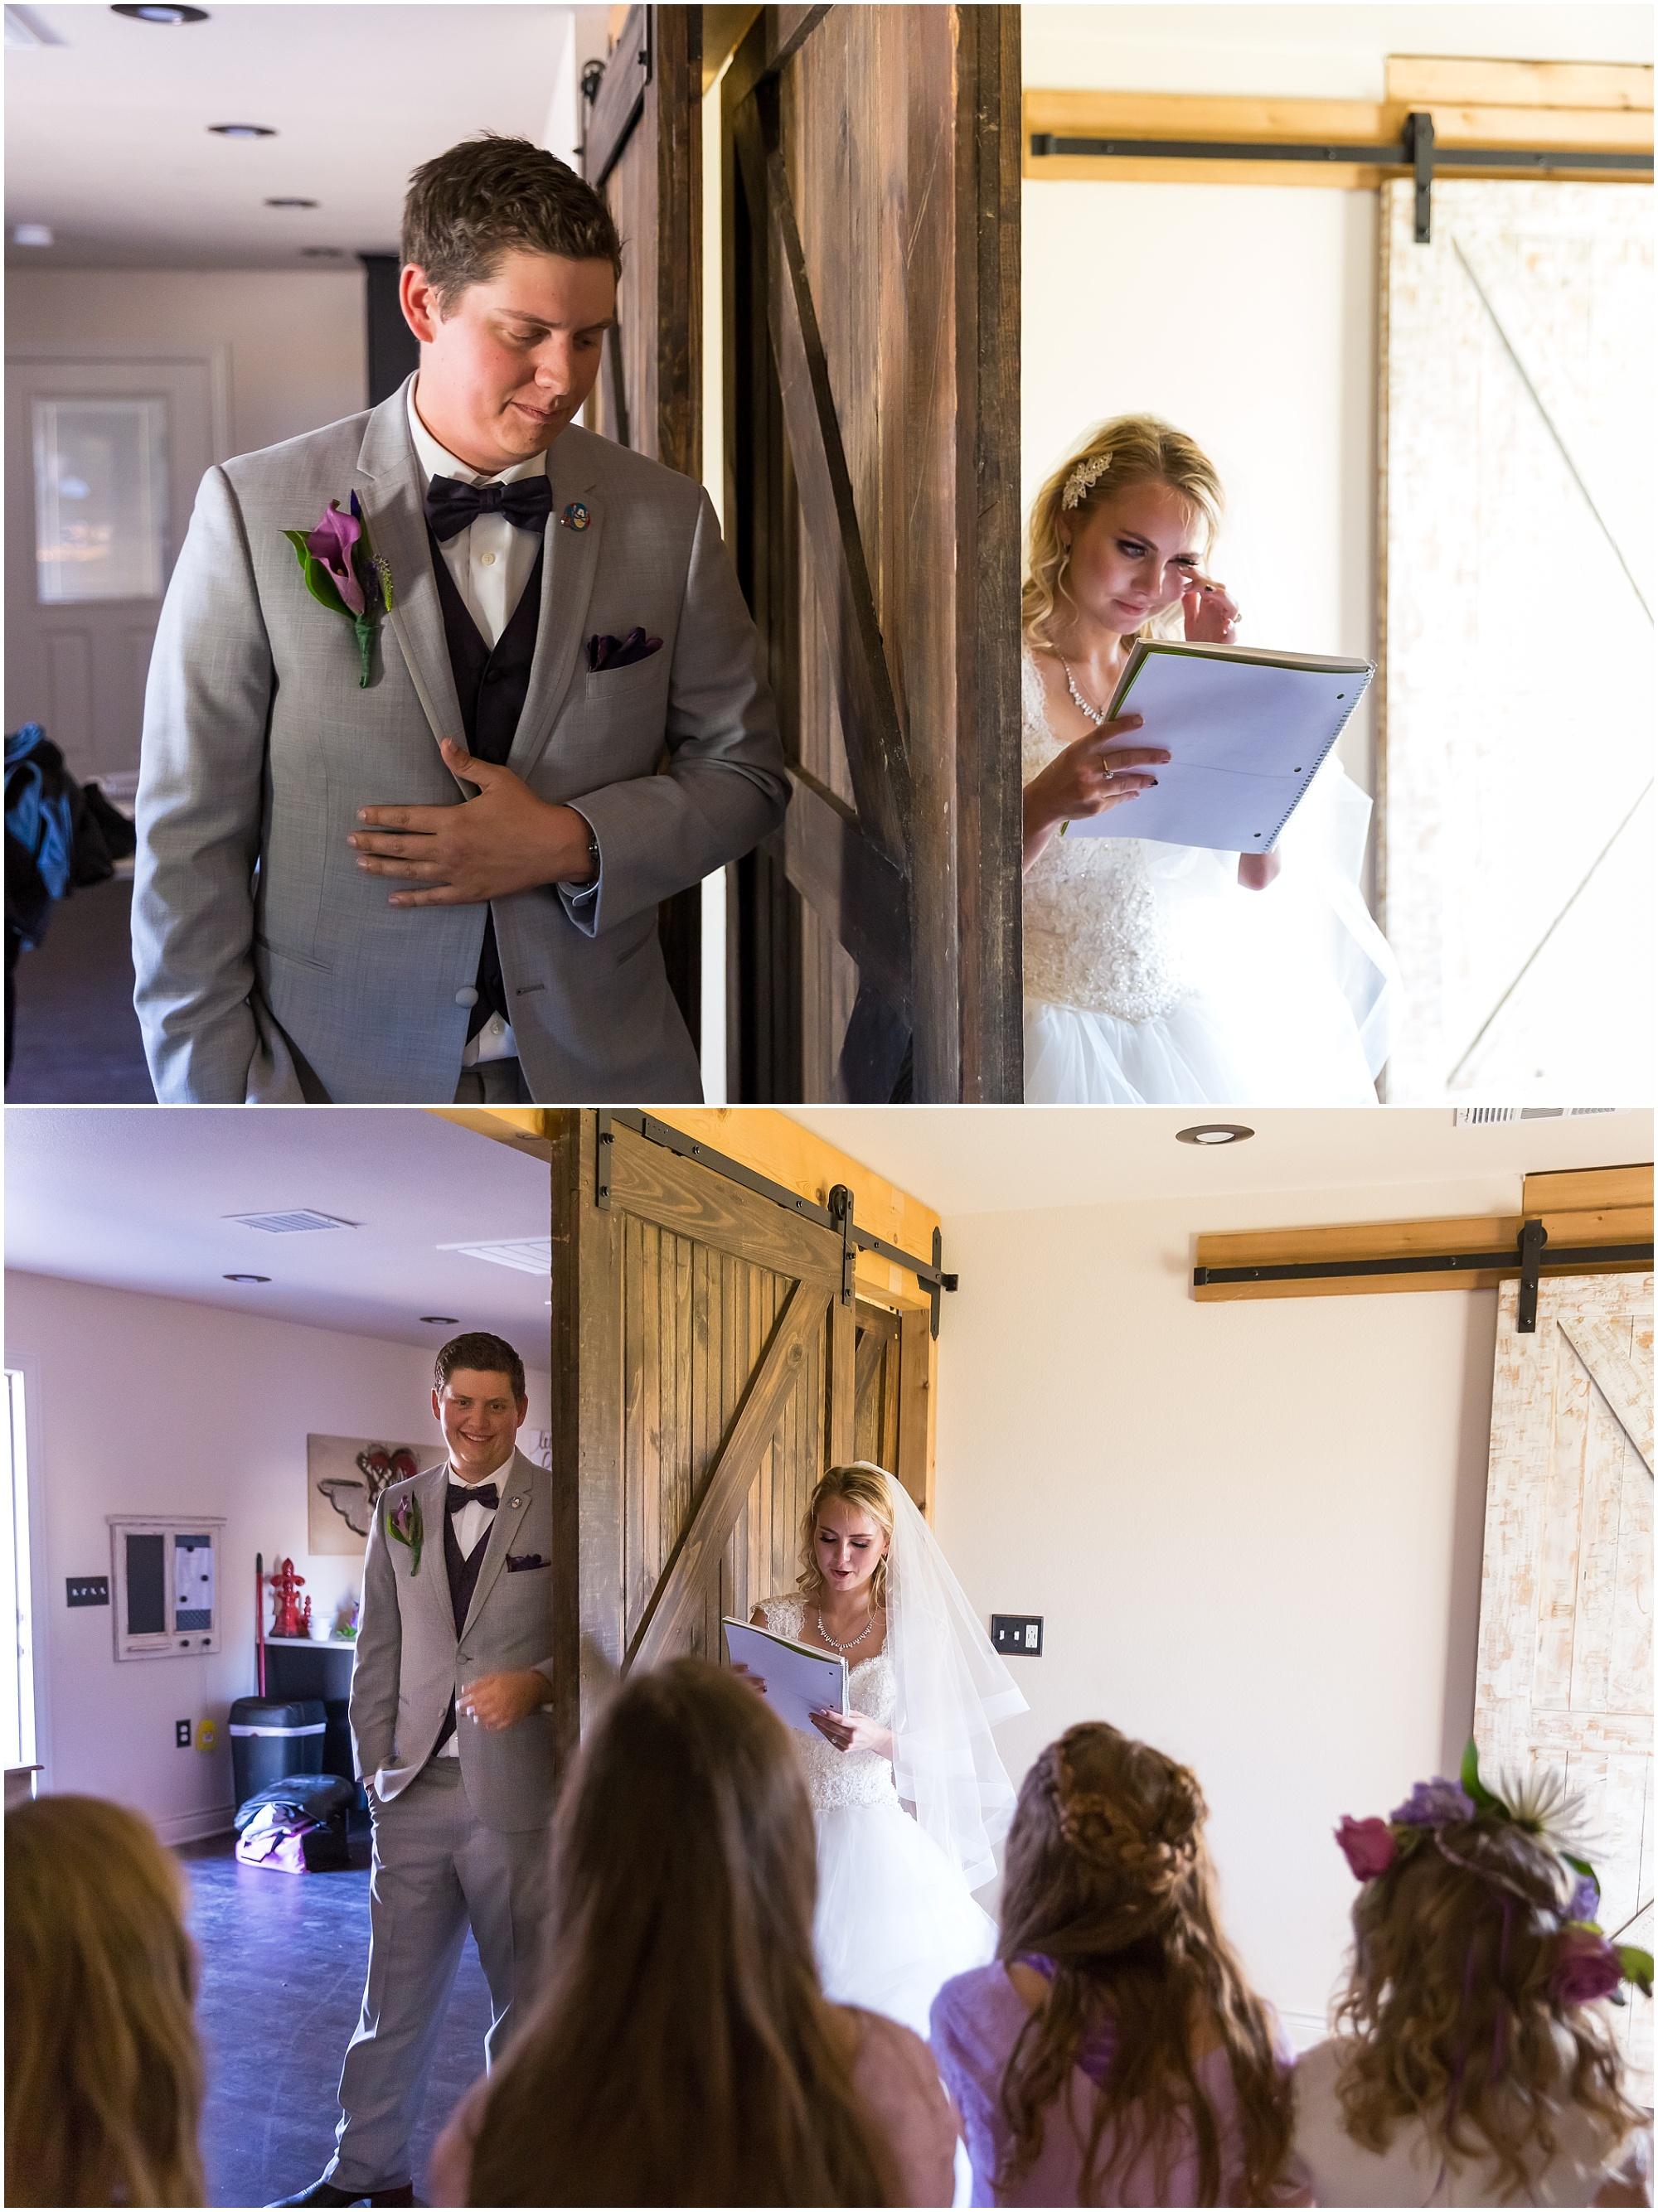 Disney-Inspired-Wedding-Central-Texas_0028.jpg